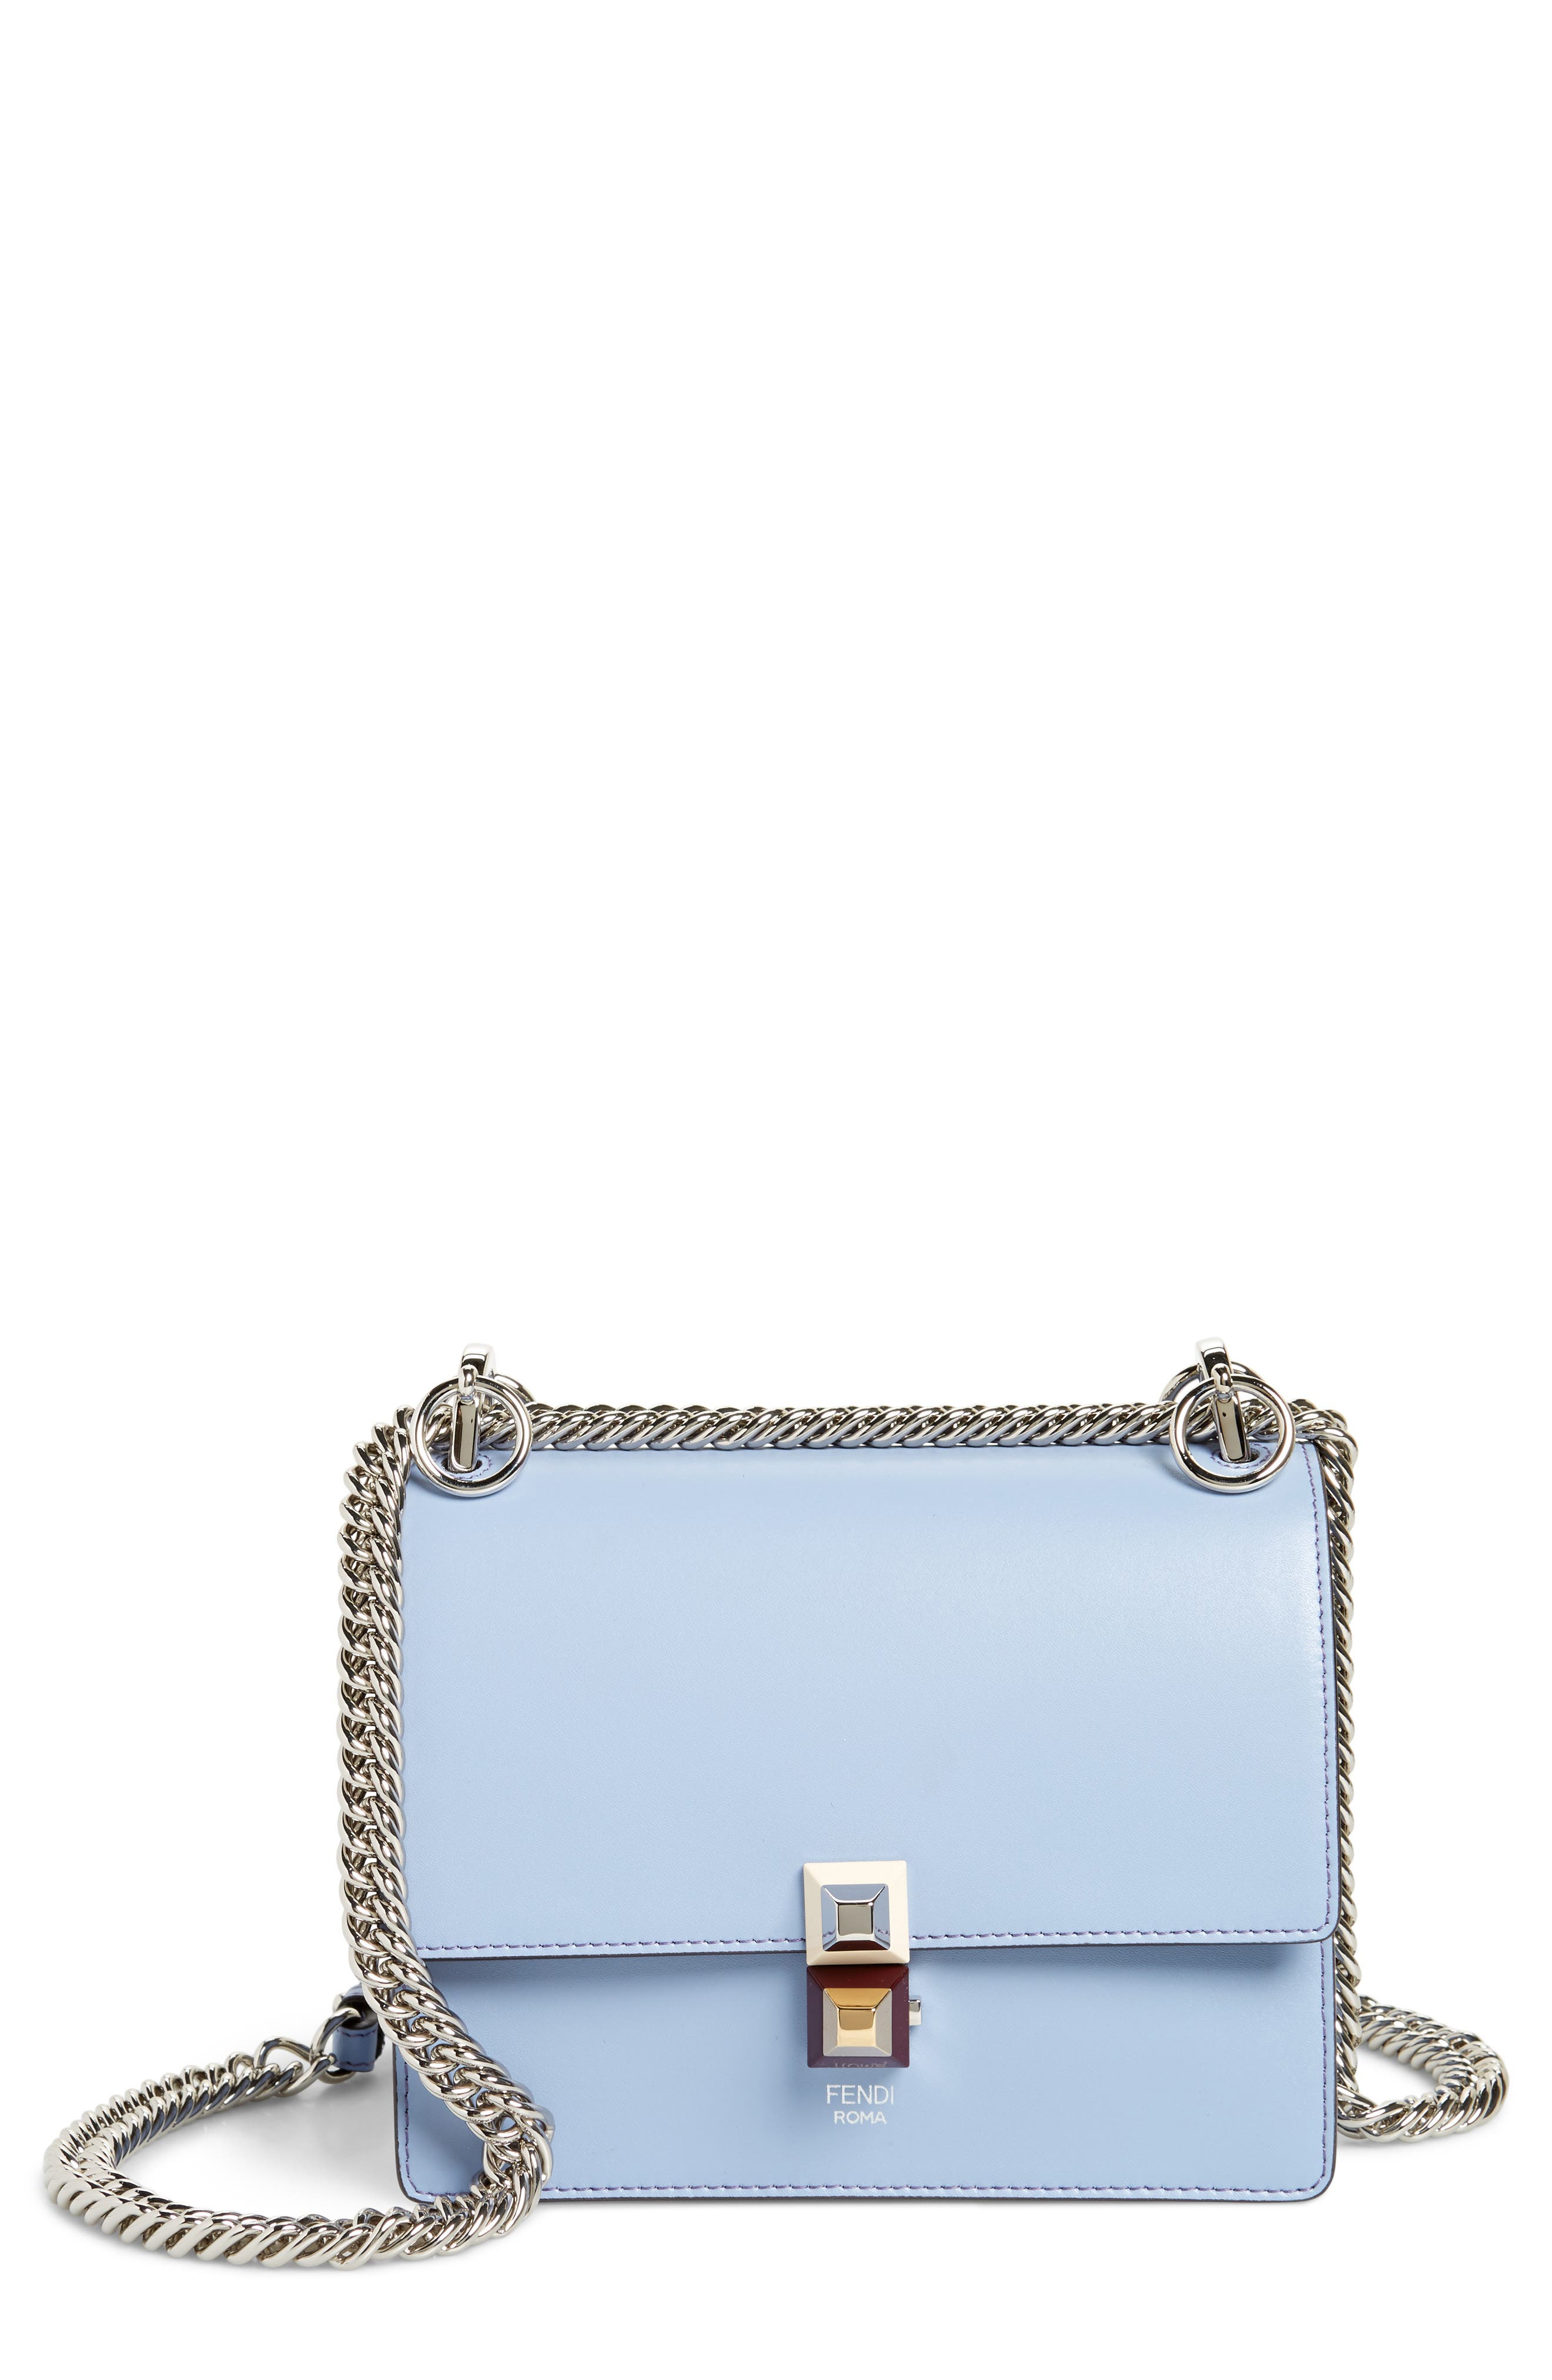 Mini Kan I Leather Shoulder Bag,                             Main thumbnail 1, color,                             Sky